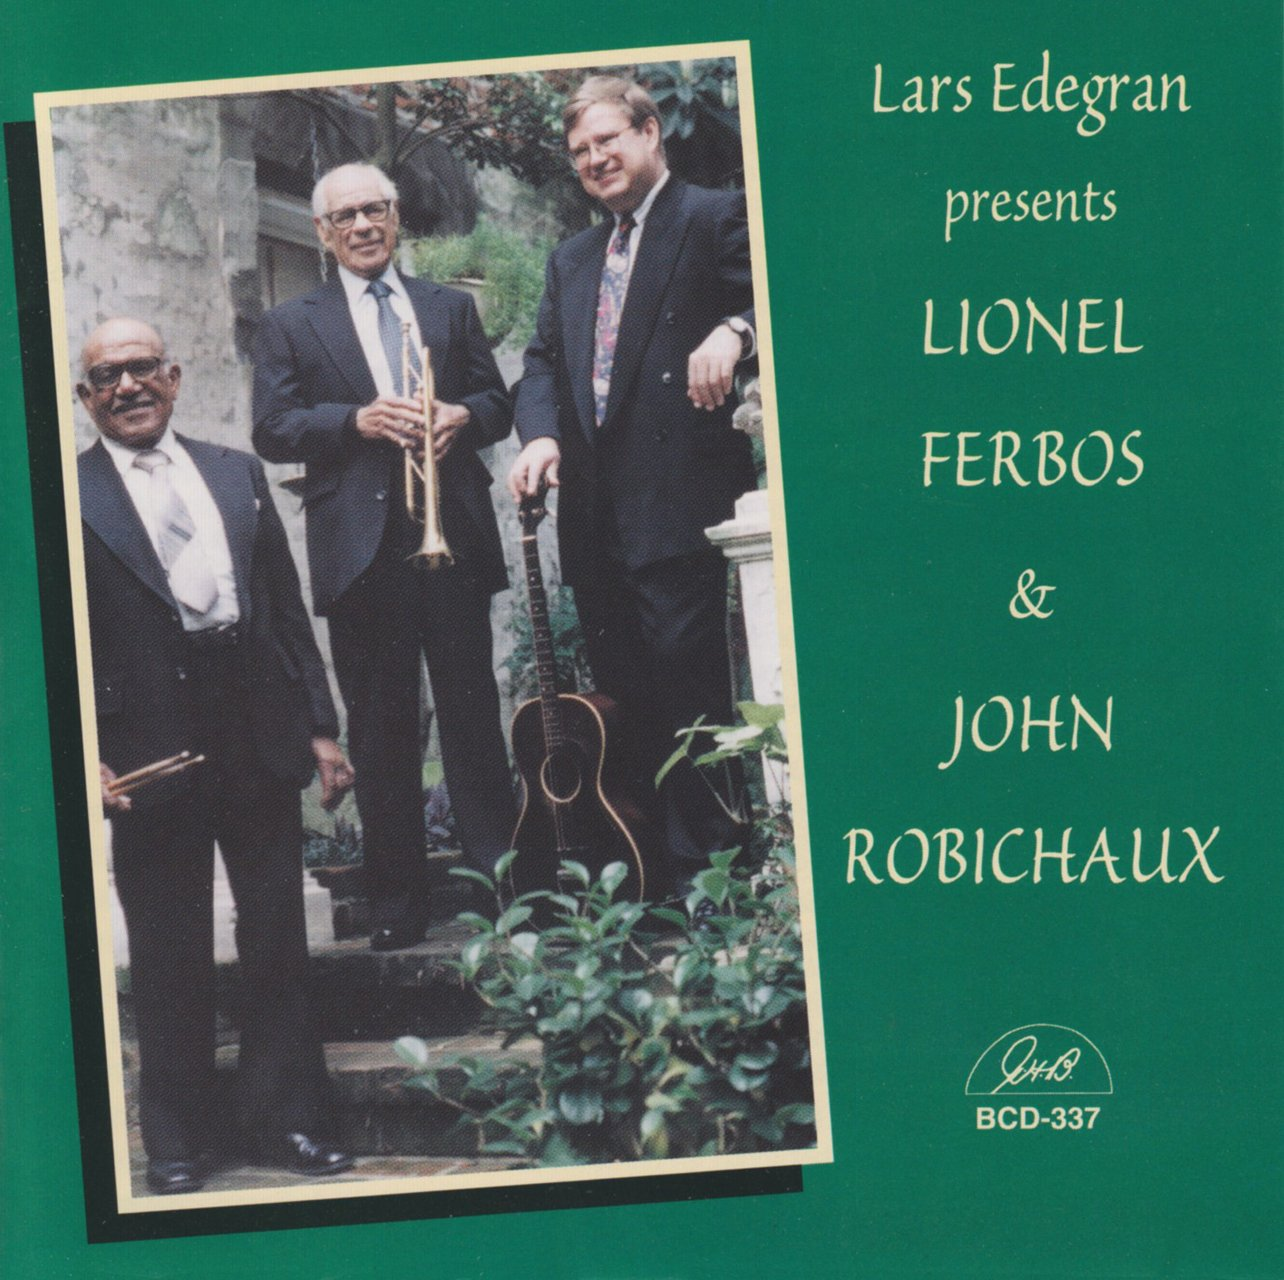 Lars Edegran - Lars Edegran Presents Lionel Ferbos and John Robichaux (CD)